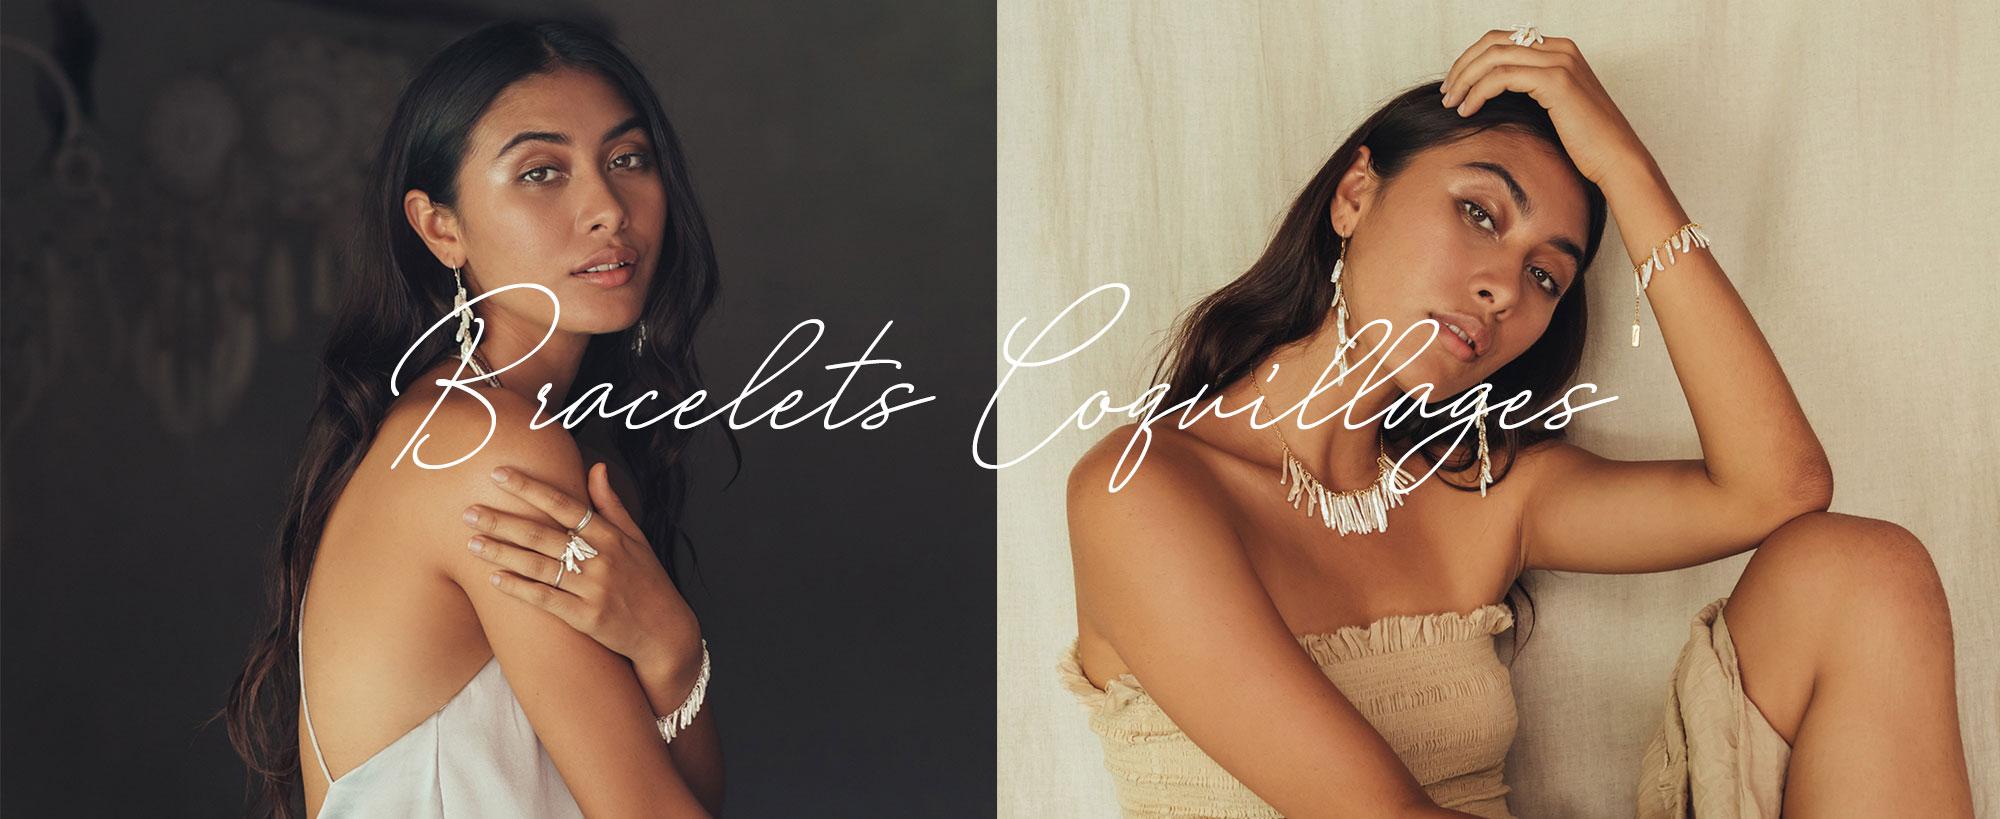 bracelets-coquillages-femmes